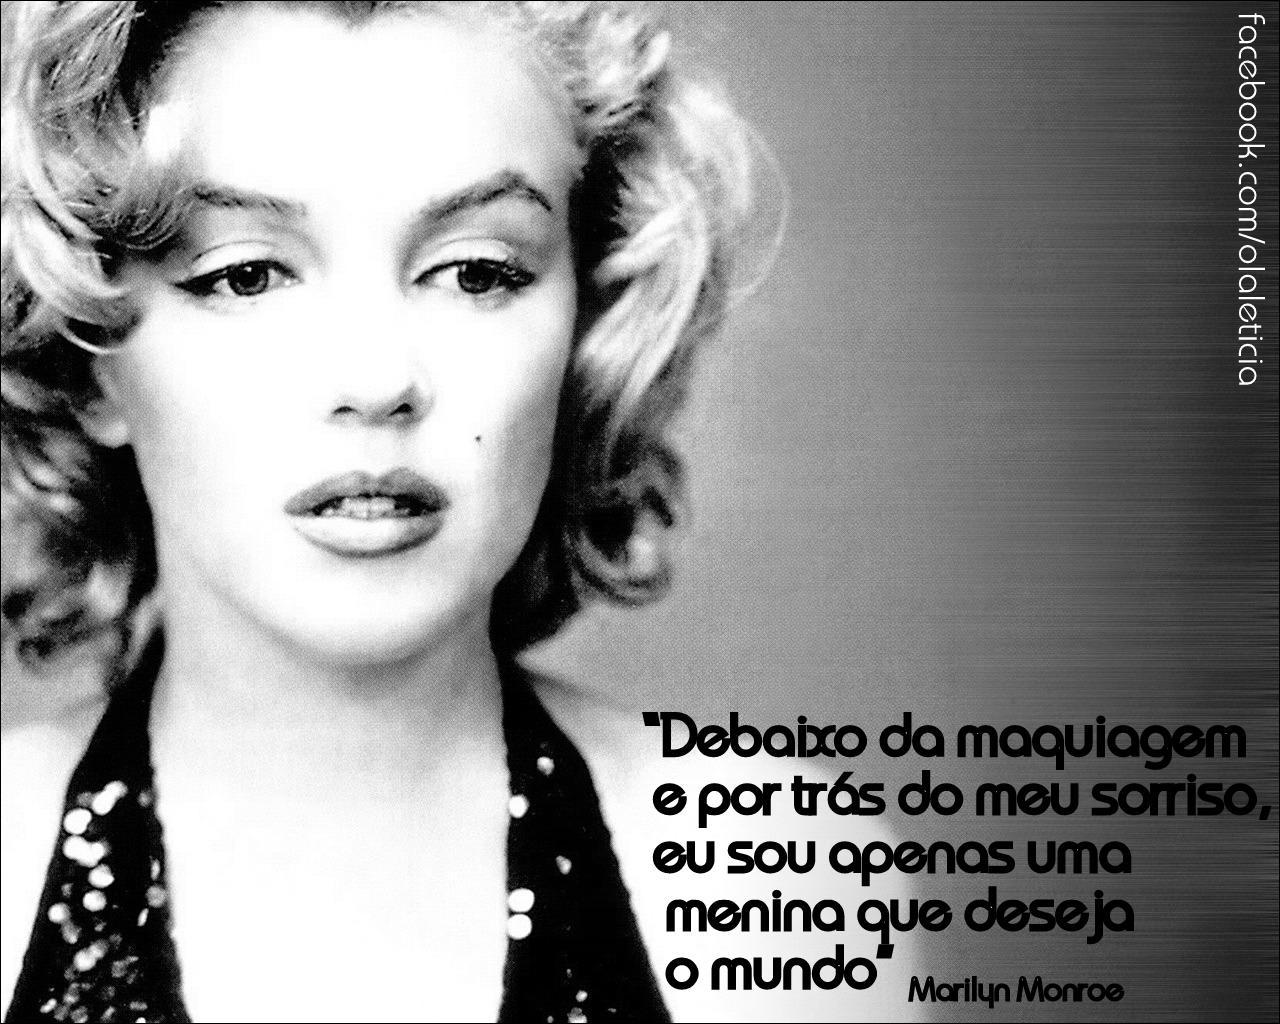 Marilyn-Monroe-Screen-Saver-001.jpg